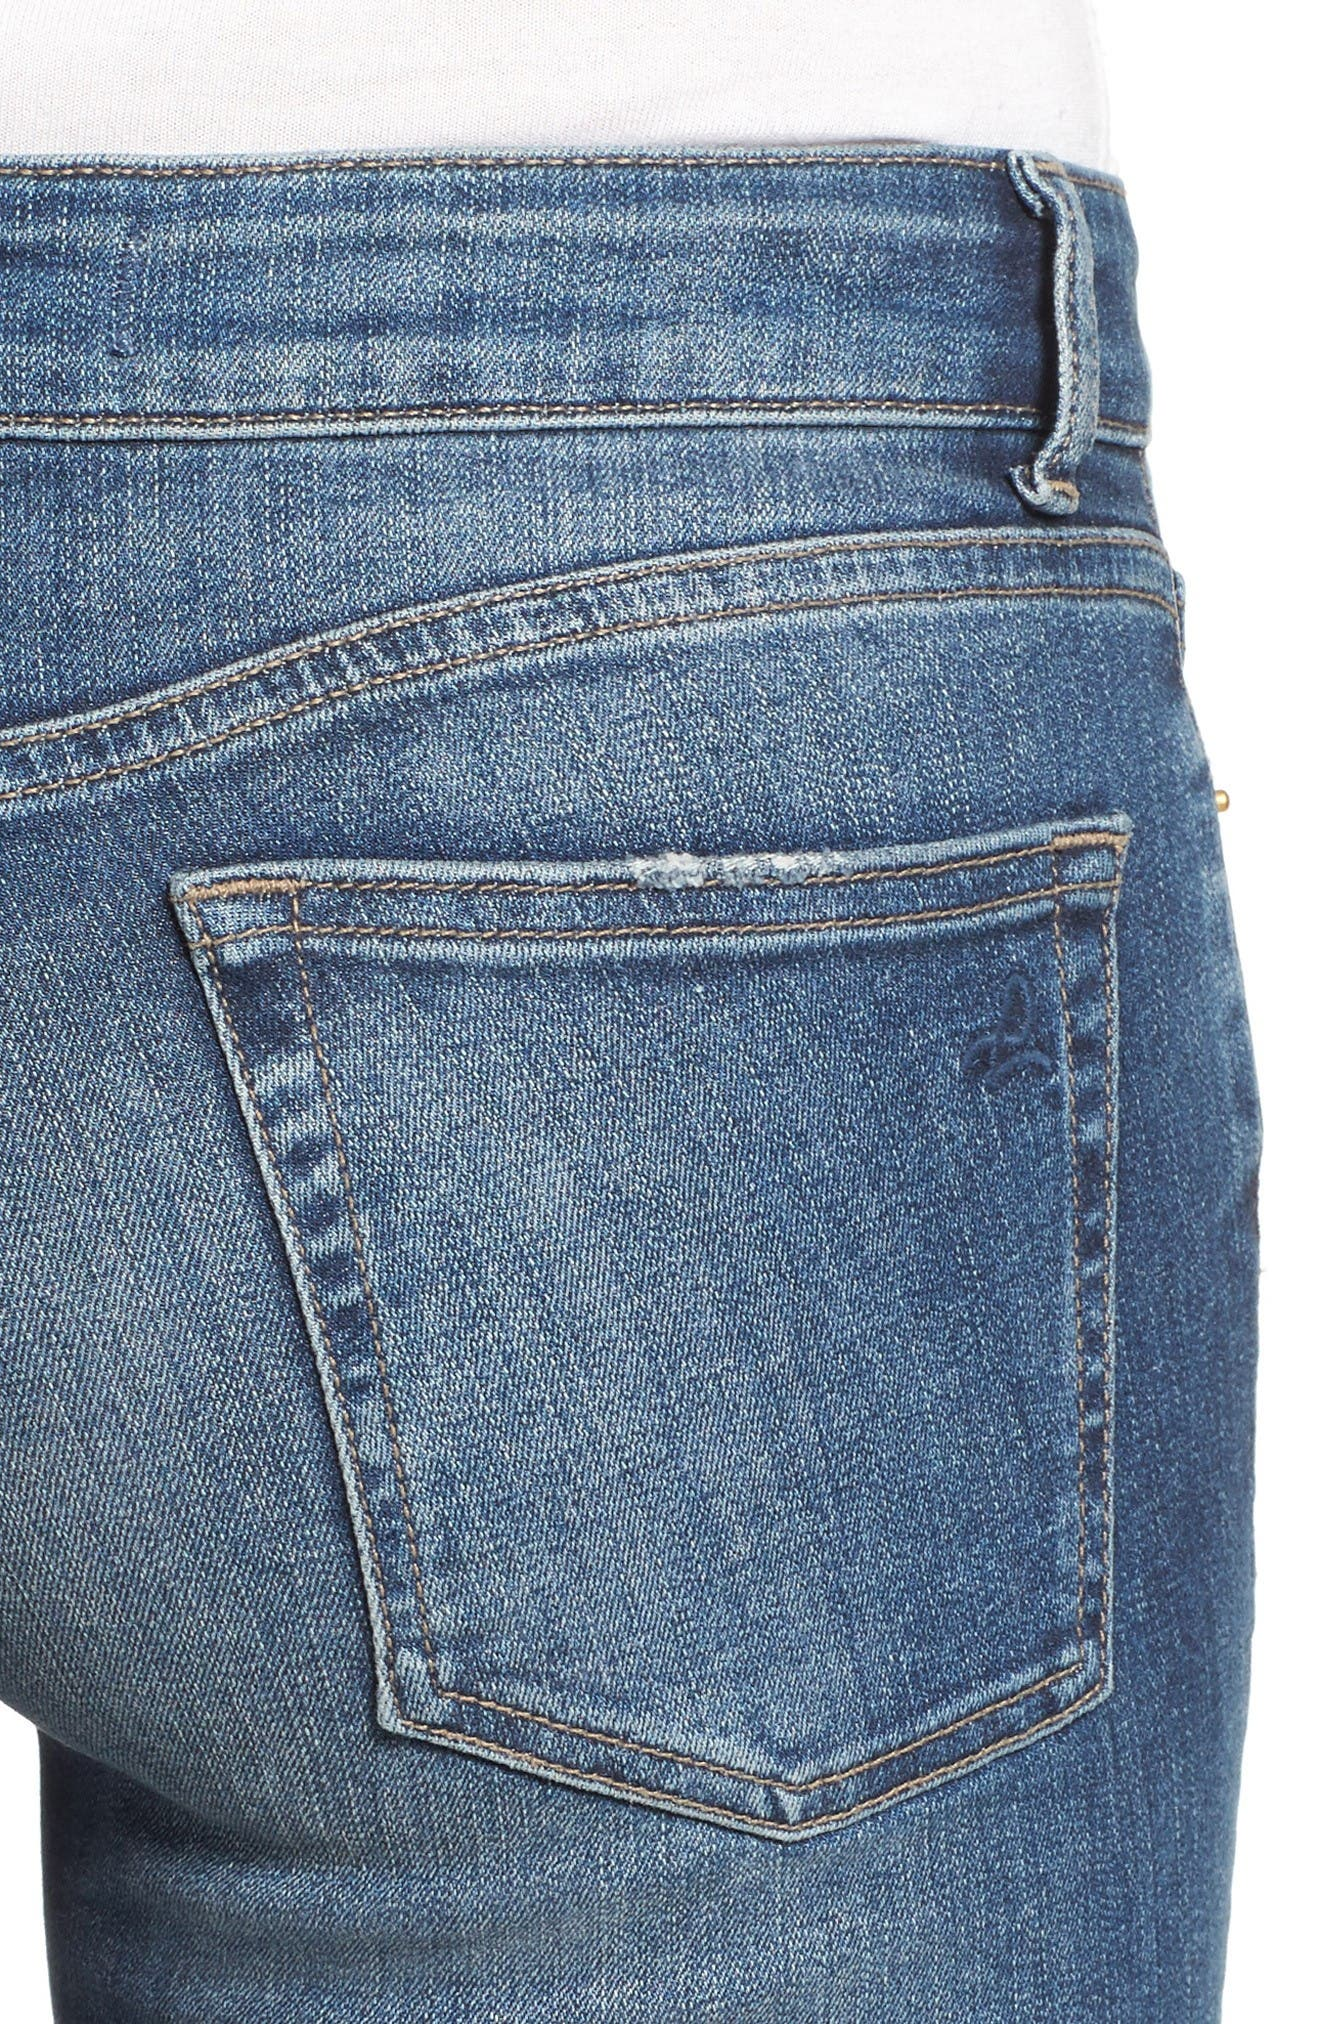 Alternate Image 4  - DL1961 Florence Instasculpt Skinny Jeans (Wicked)